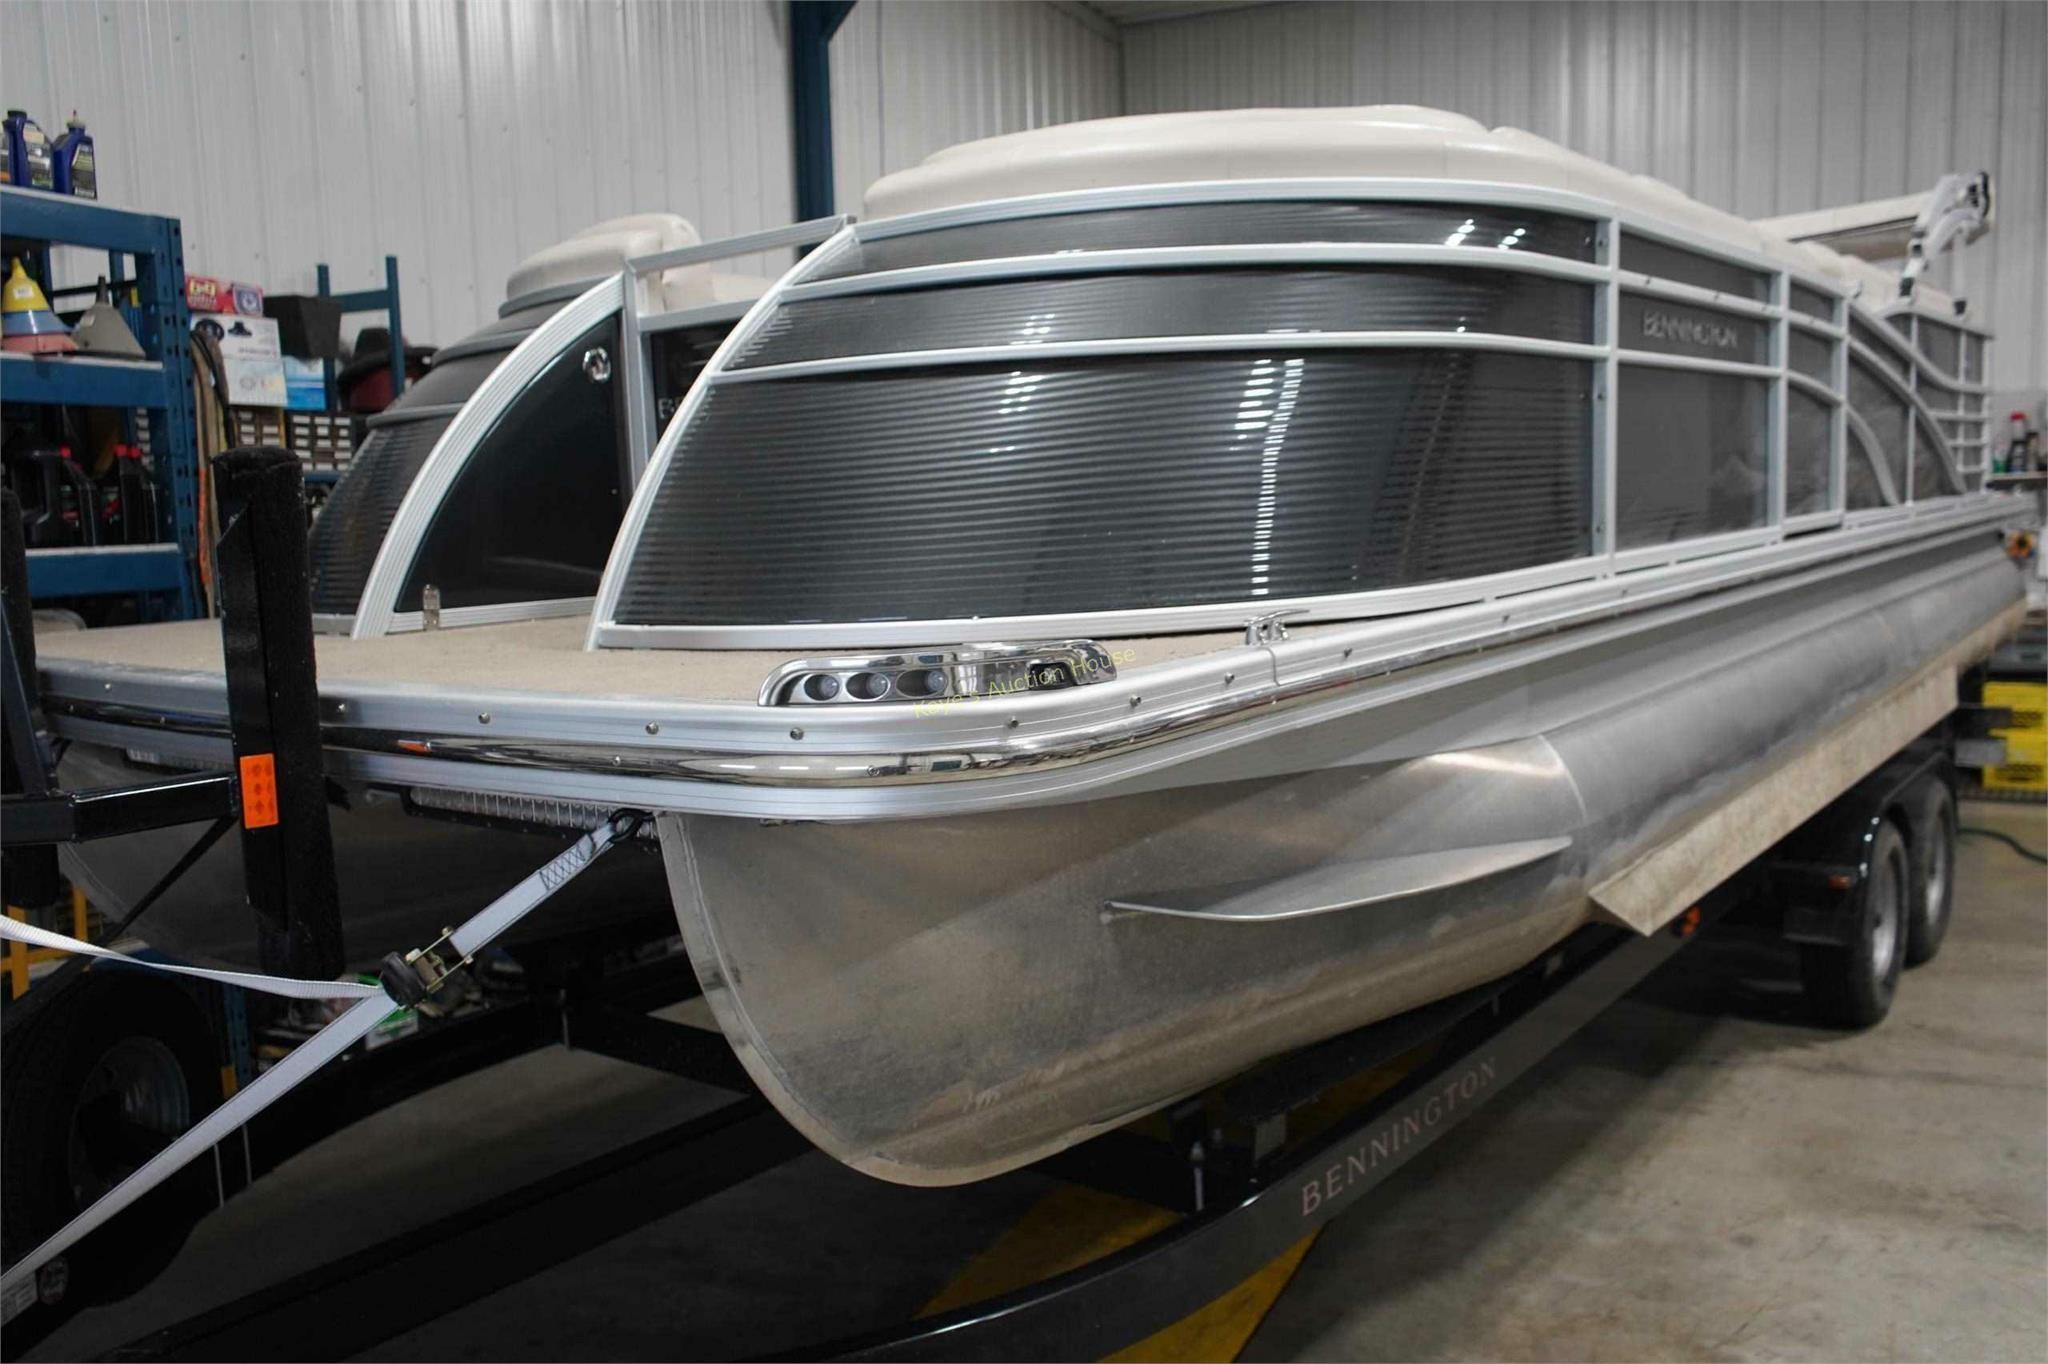 2014 Bennington Q23 Pontoon boat w/trailer